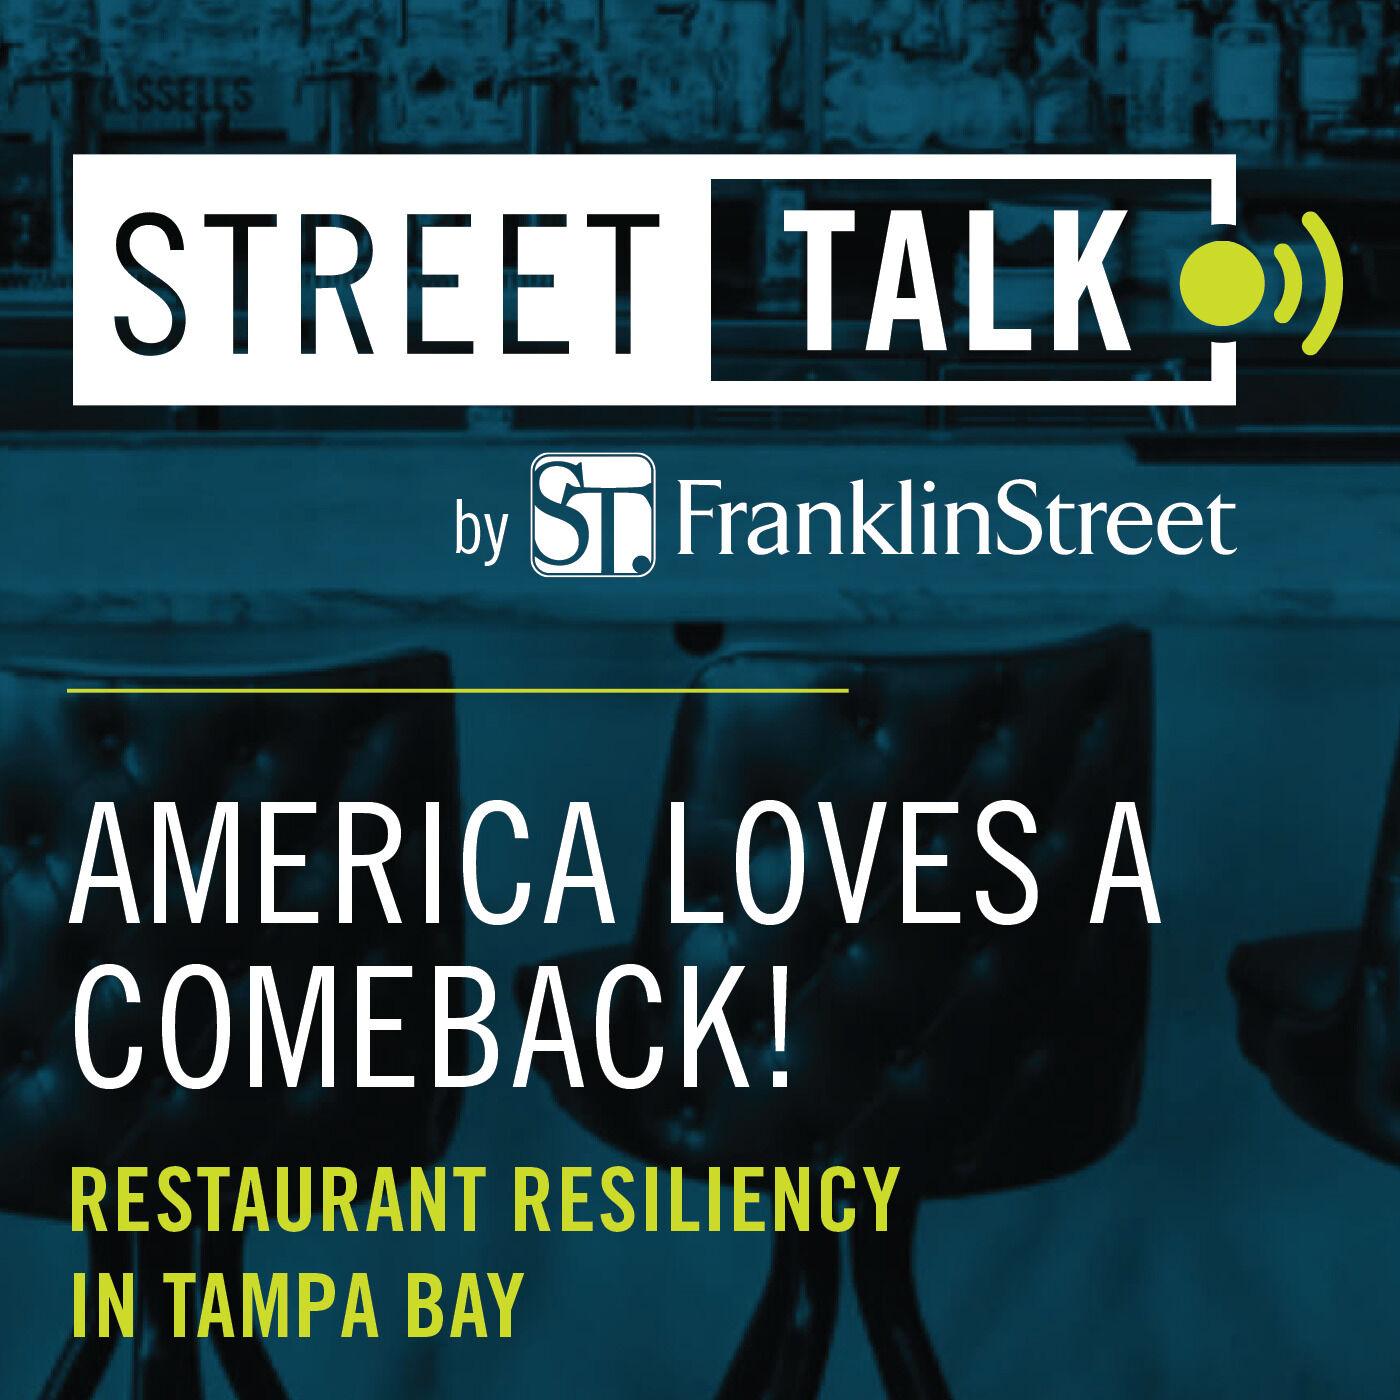 America Loves a Comeback! Restaurant Resiliency in Tampa Bay